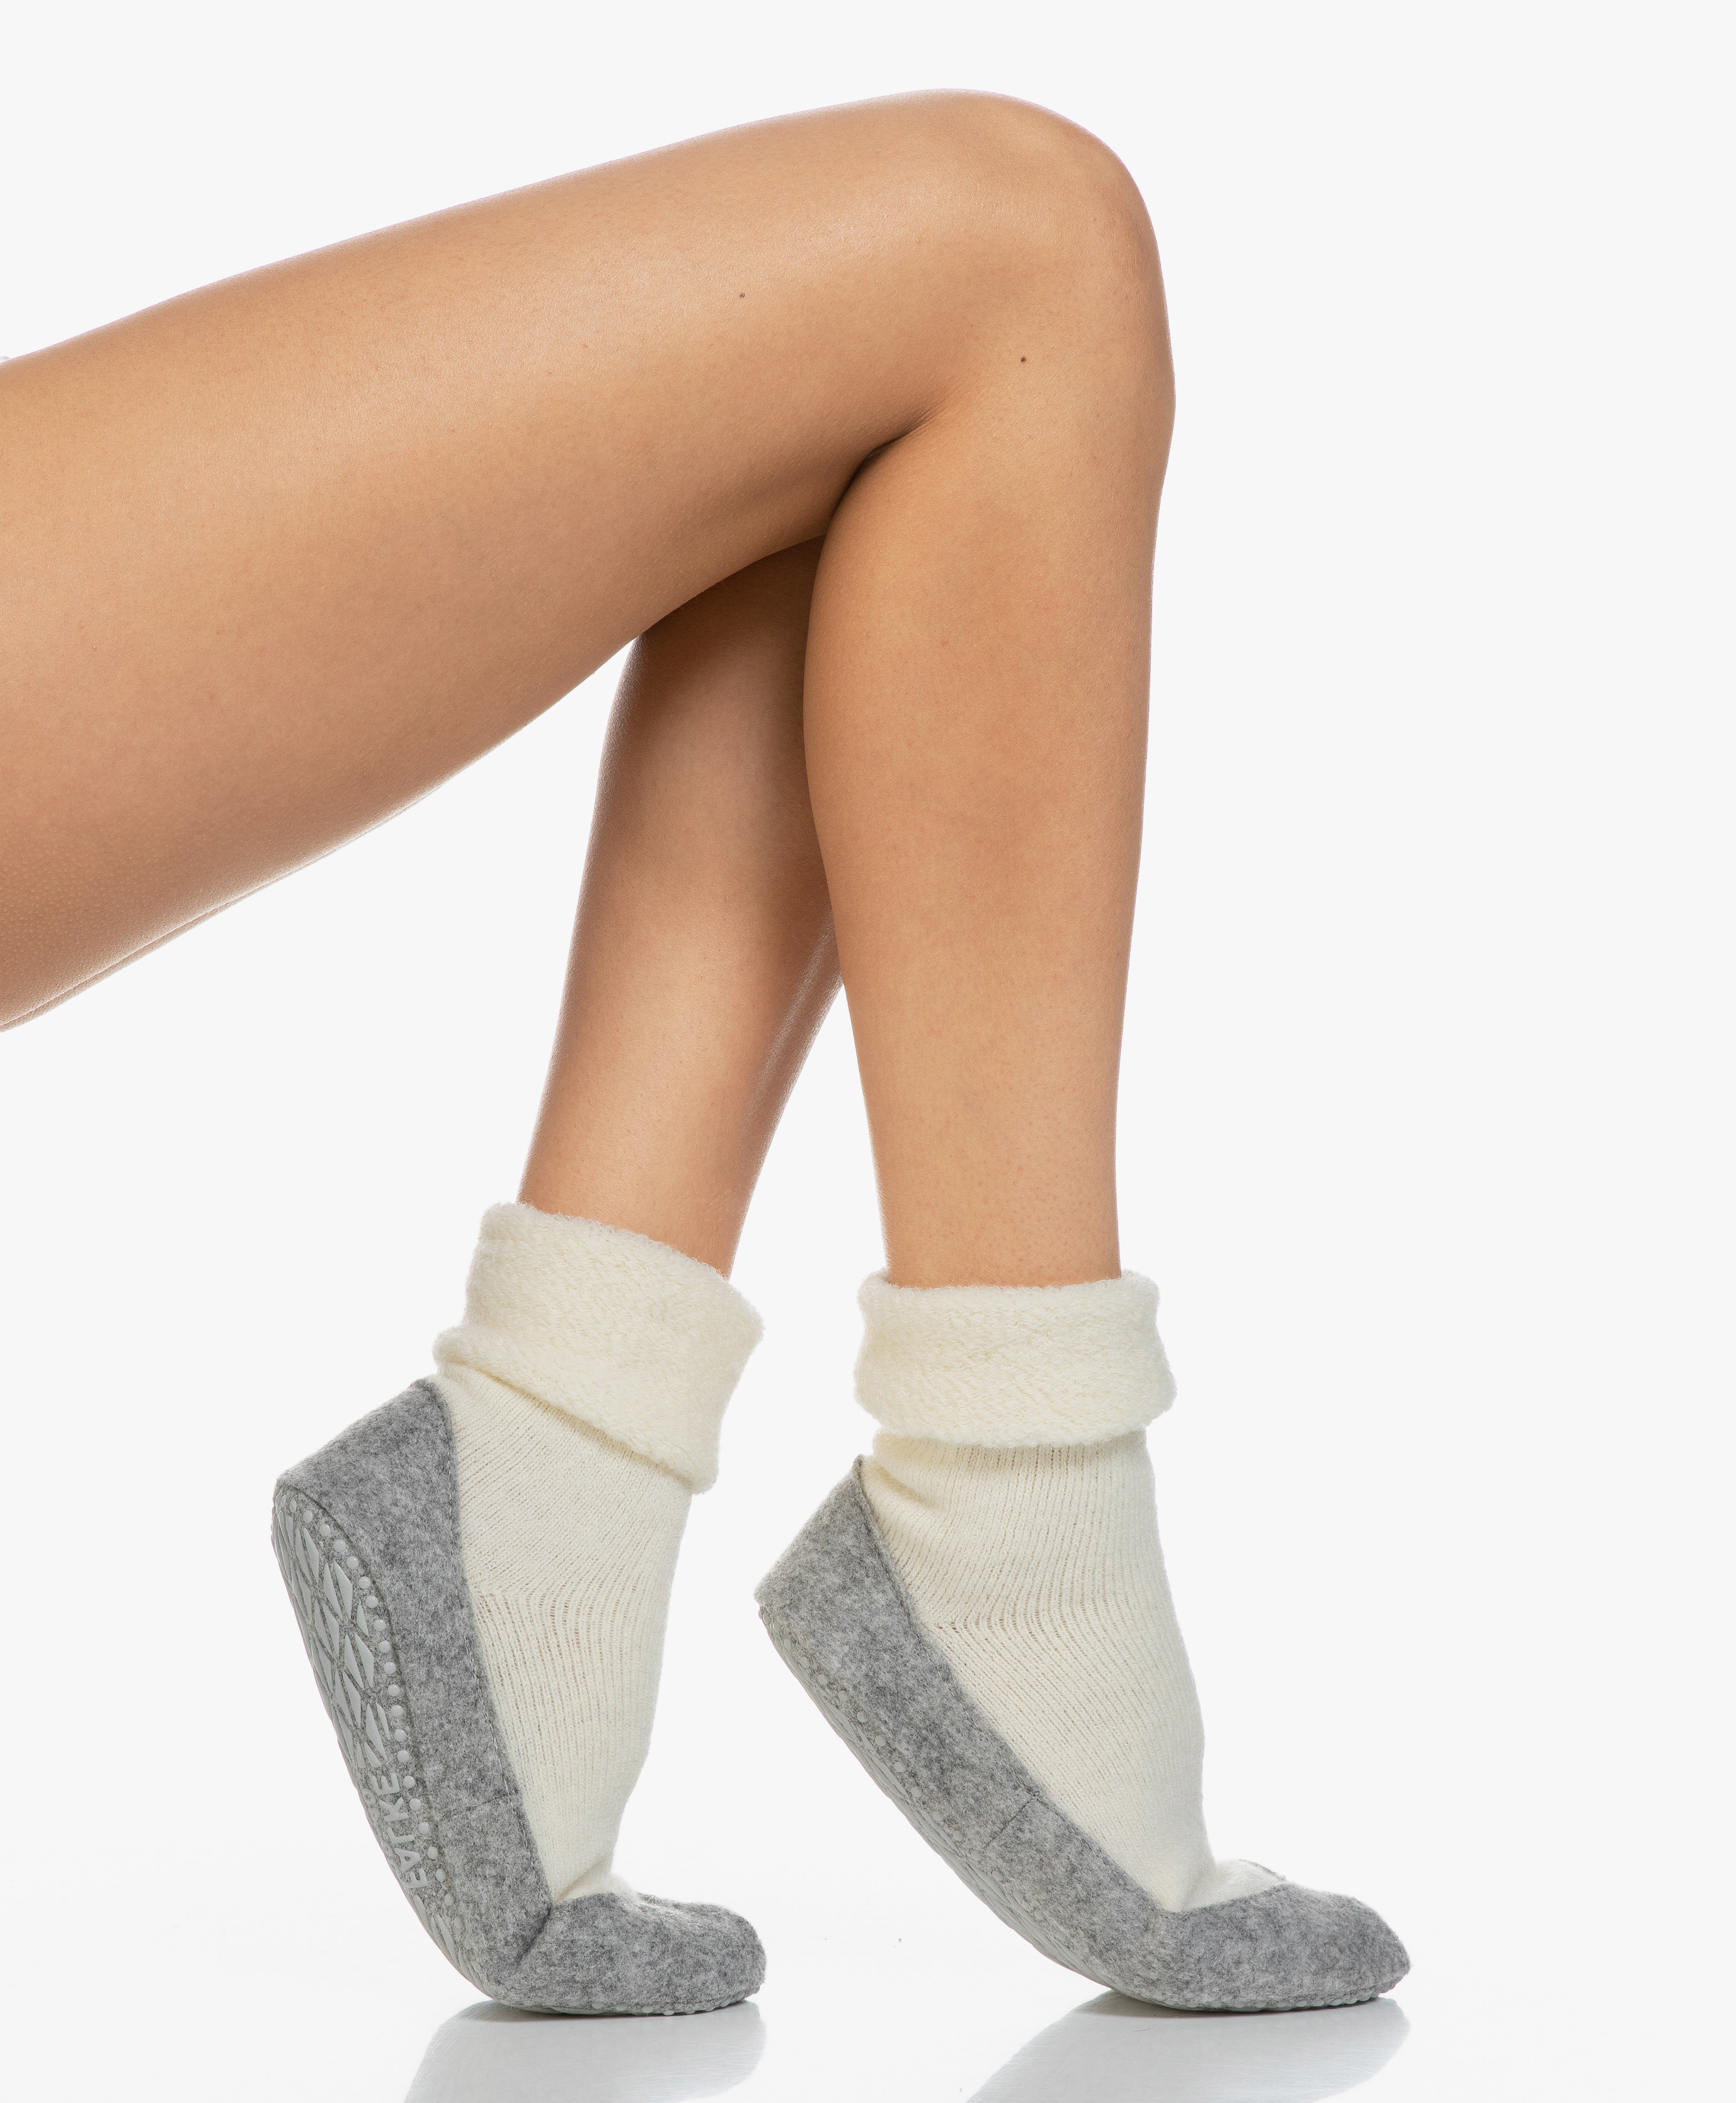 Anthracite Grey Falke Cosyshoe Slipper Socks